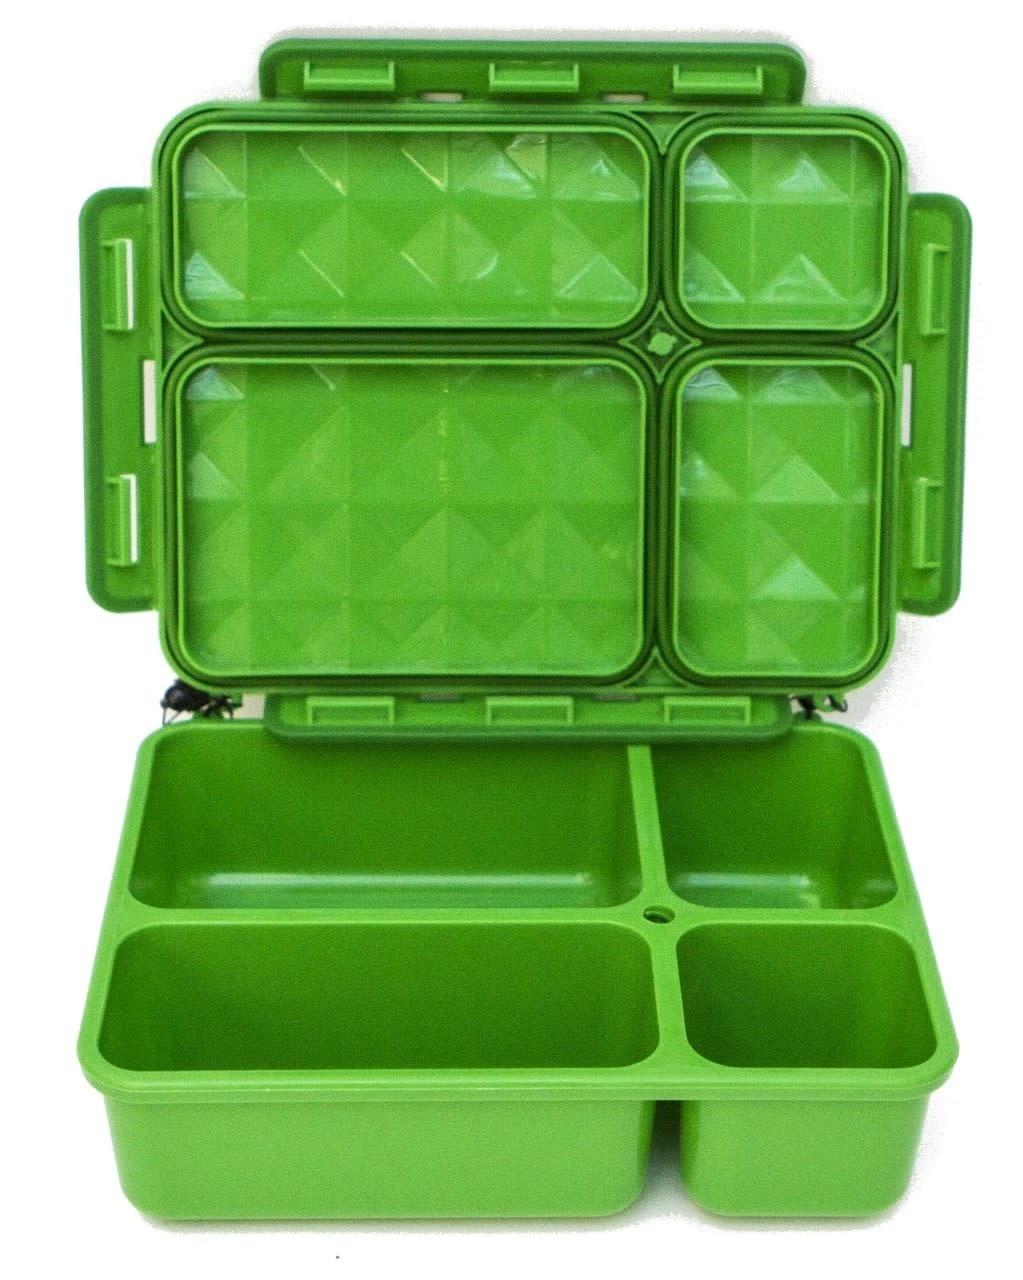 Go Green Go Green Lunch Box